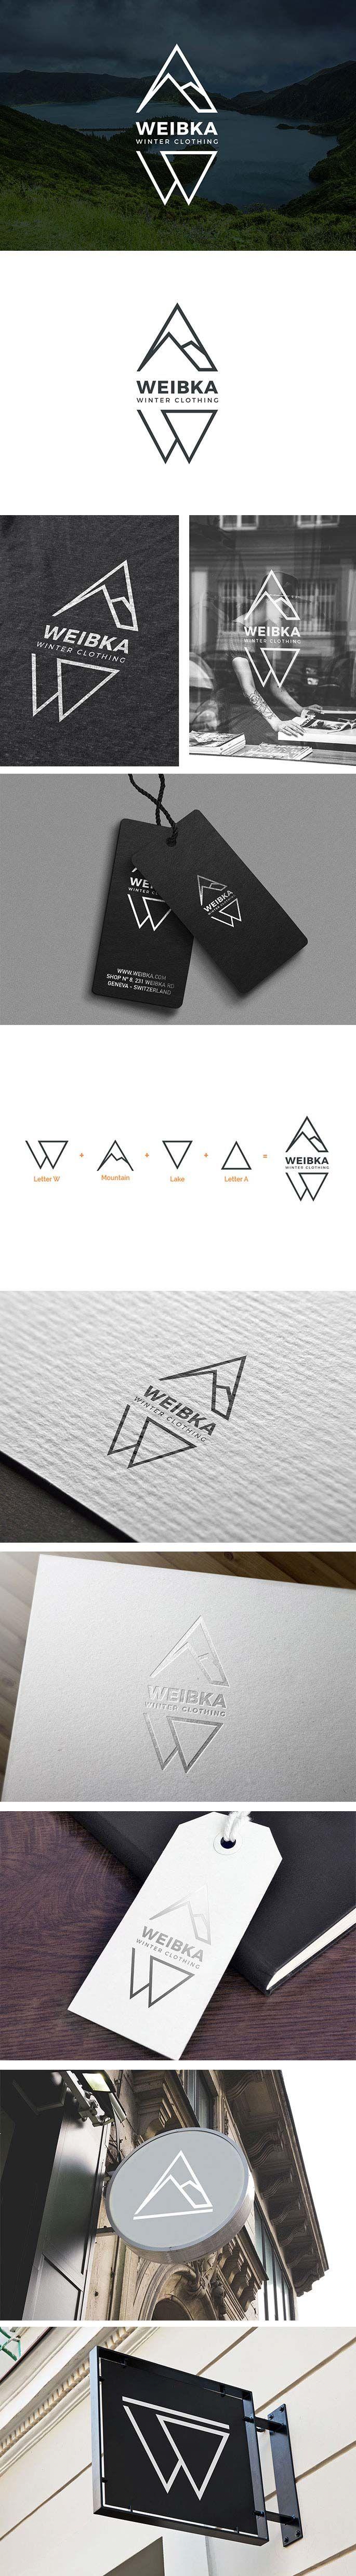 Logo Design Fashion, Clothing & Sport Brand Identity  |  Letter W, Letter A, Geo...